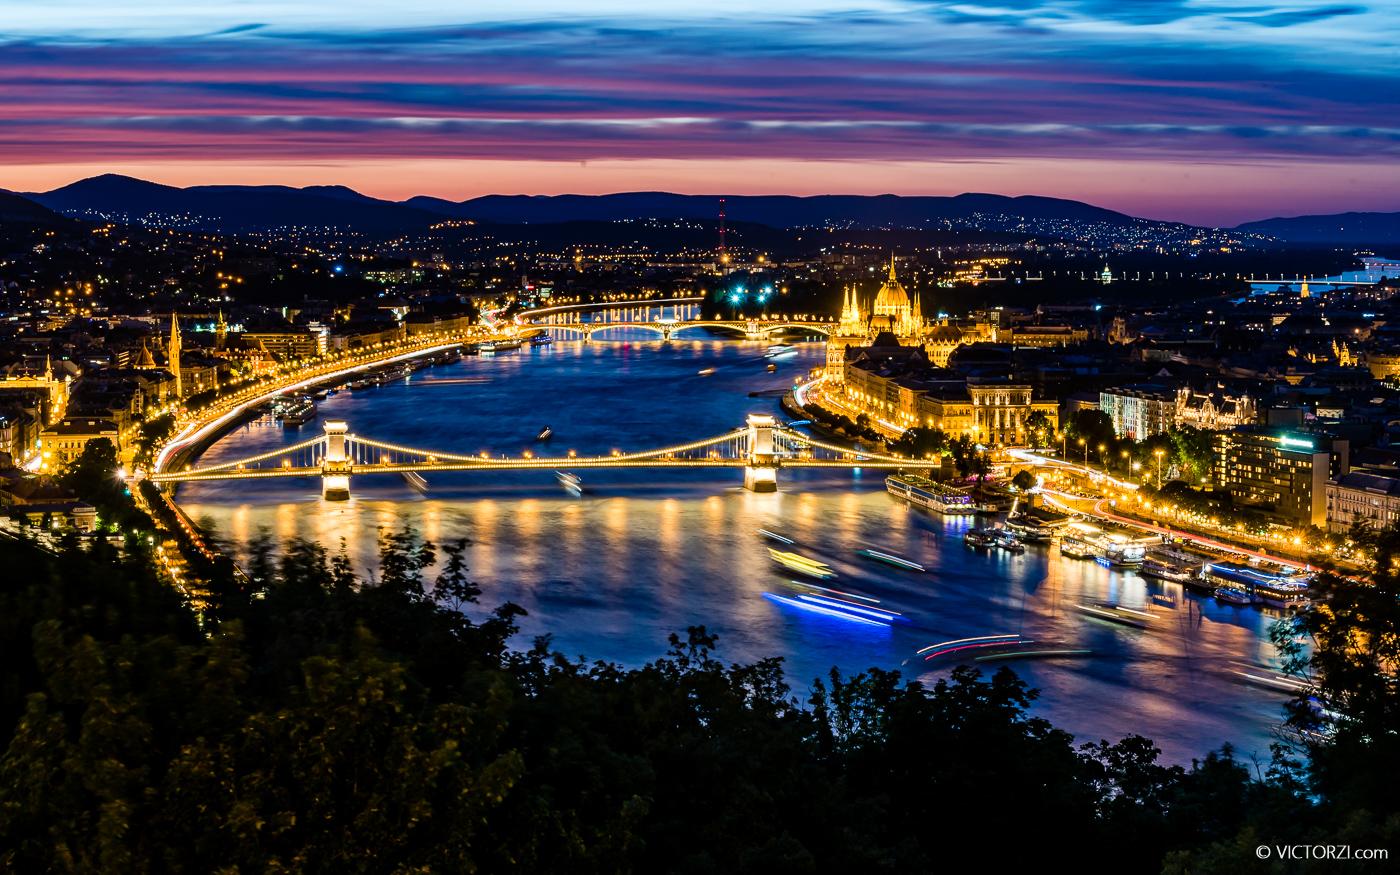 20190703 - Budapest 1400px - 2236